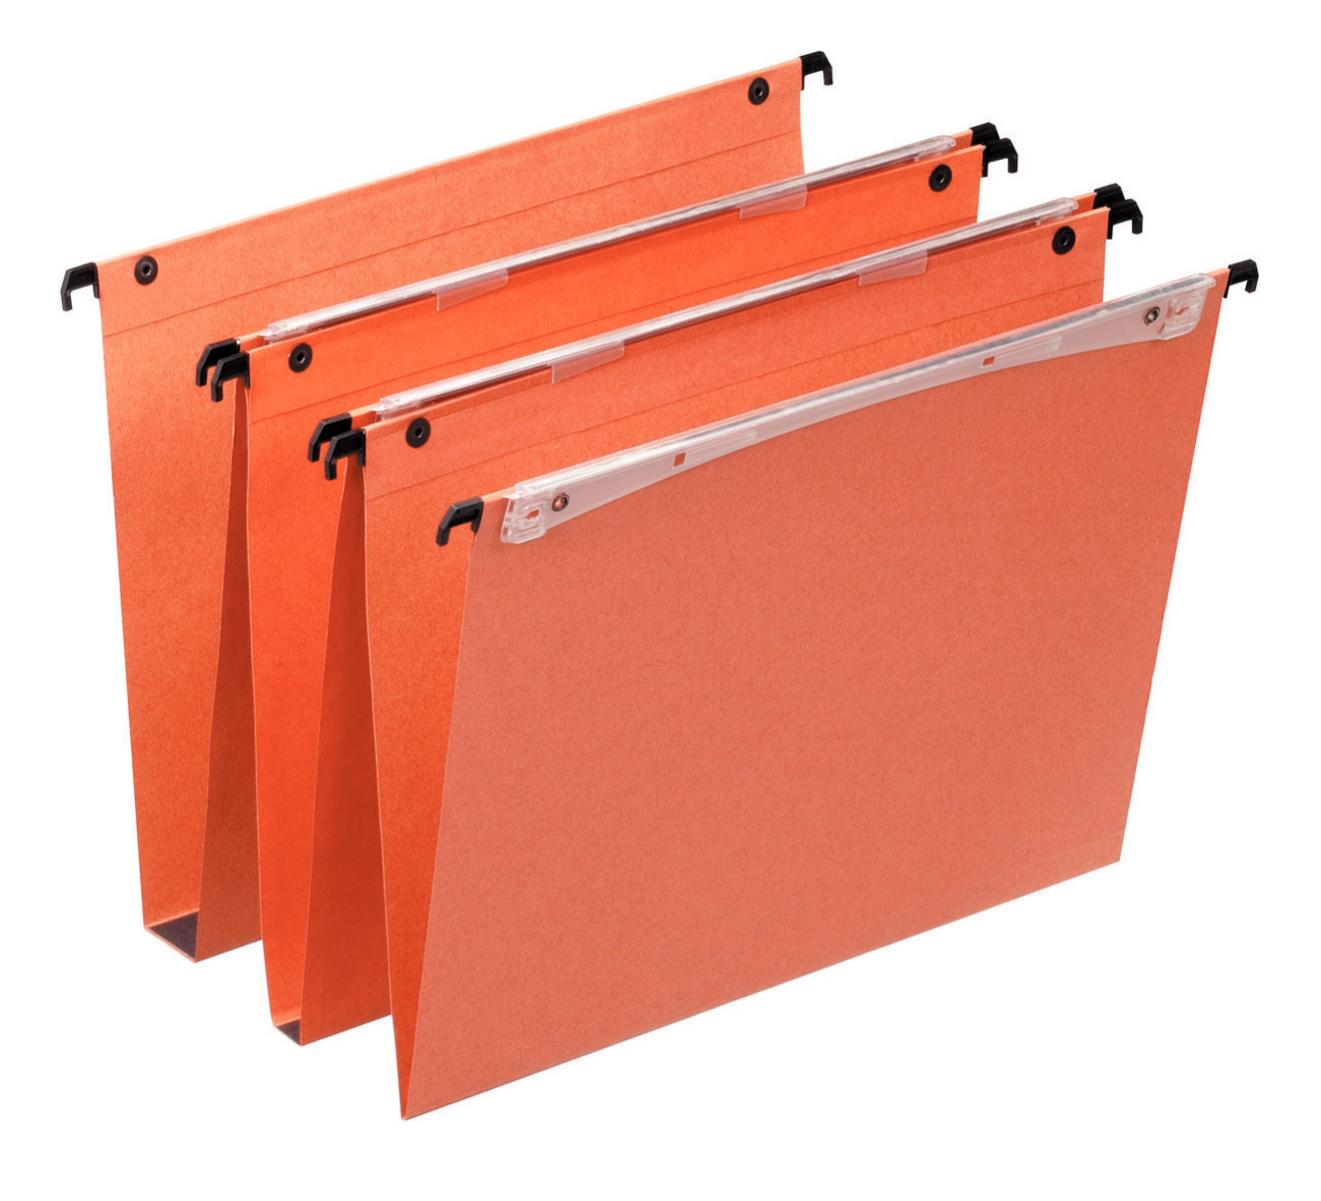 Suspension File Orgarex Dual Vertical Susp File A4 15mm Base 330mm BX25